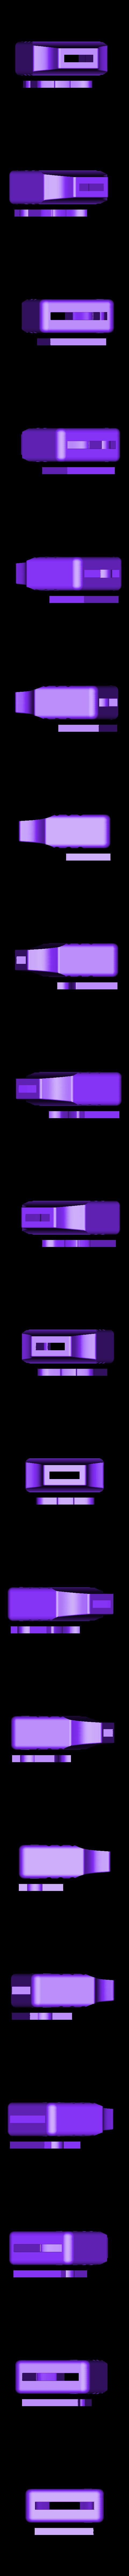 AdivaKey.stl Download free STL file AdivaKey • 3D printing model, Cipper